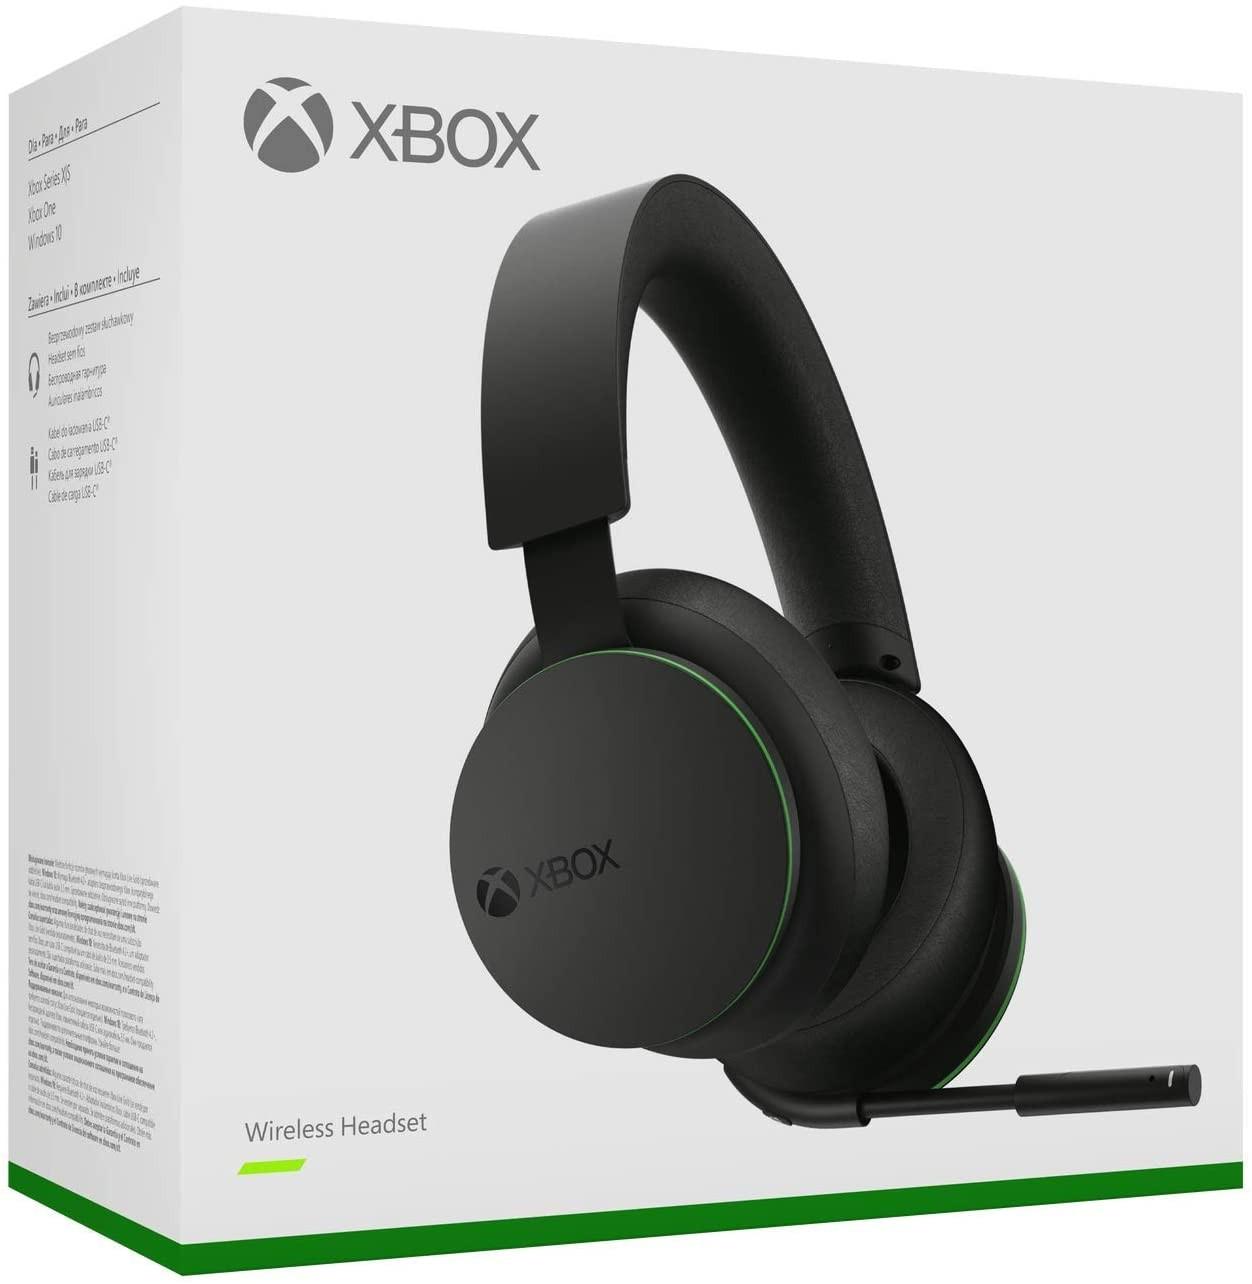 Бездротова гарнітура Xbox Wireless Headset for Xbox Series X|S, Xbox One and Windows 10